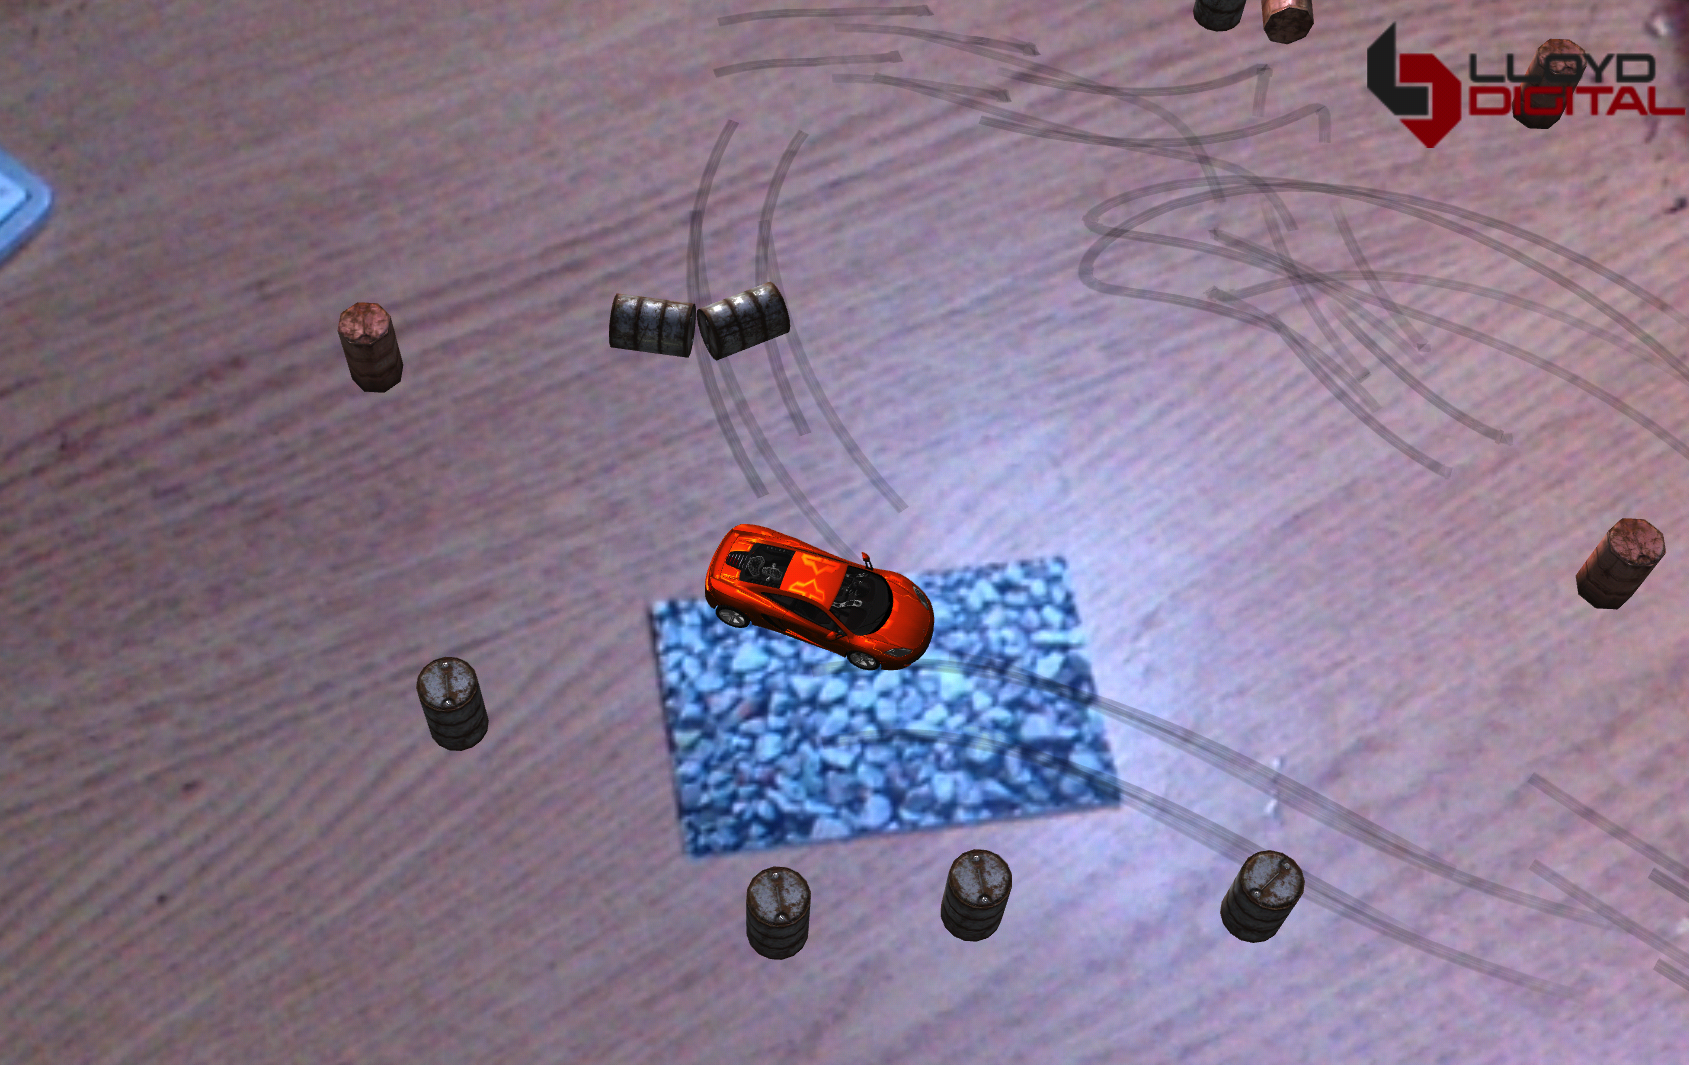 AR Car demo